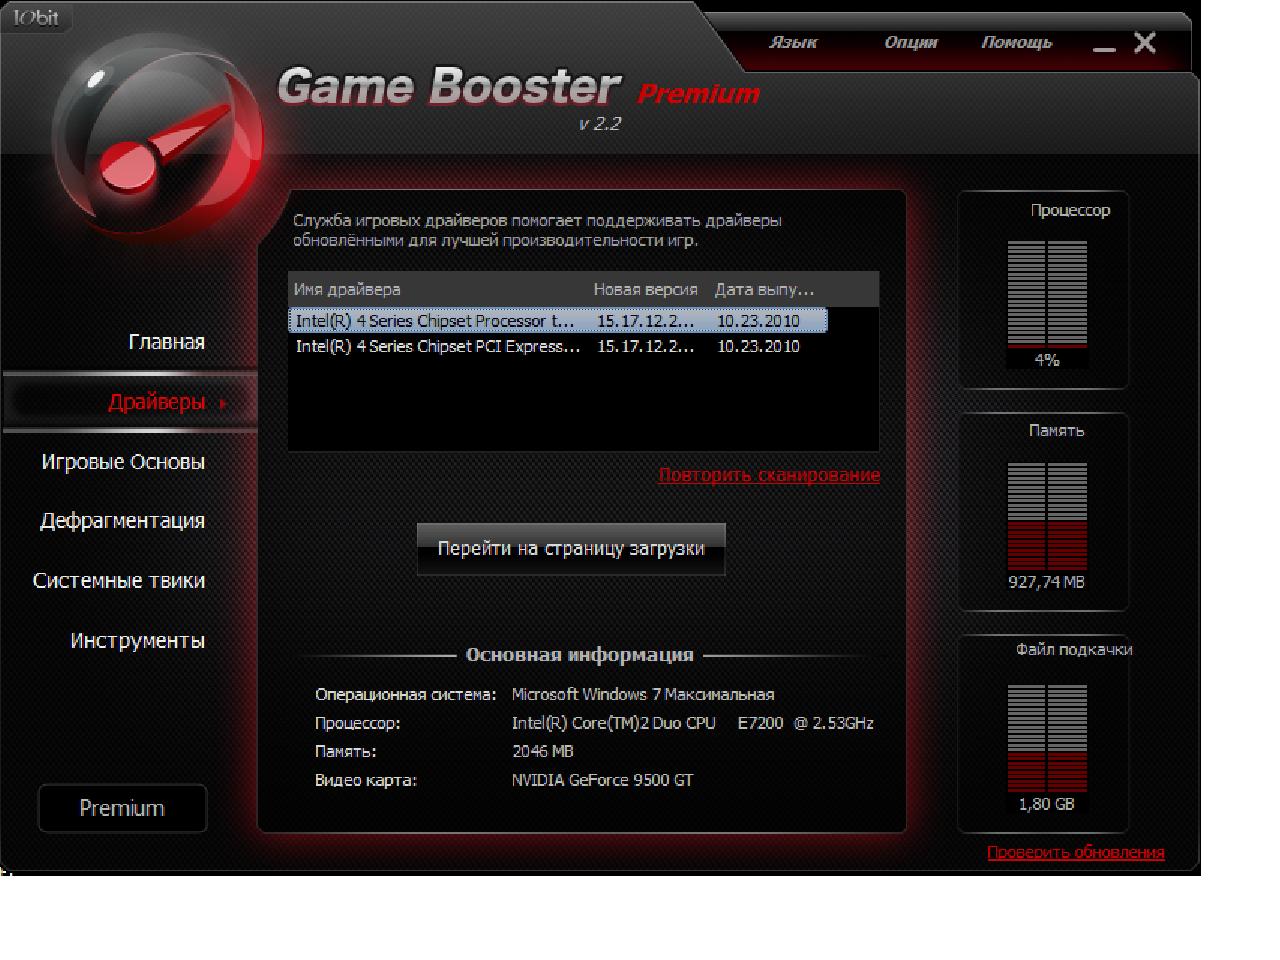 Оптимизатор Game Booster 3 Rus/2011.